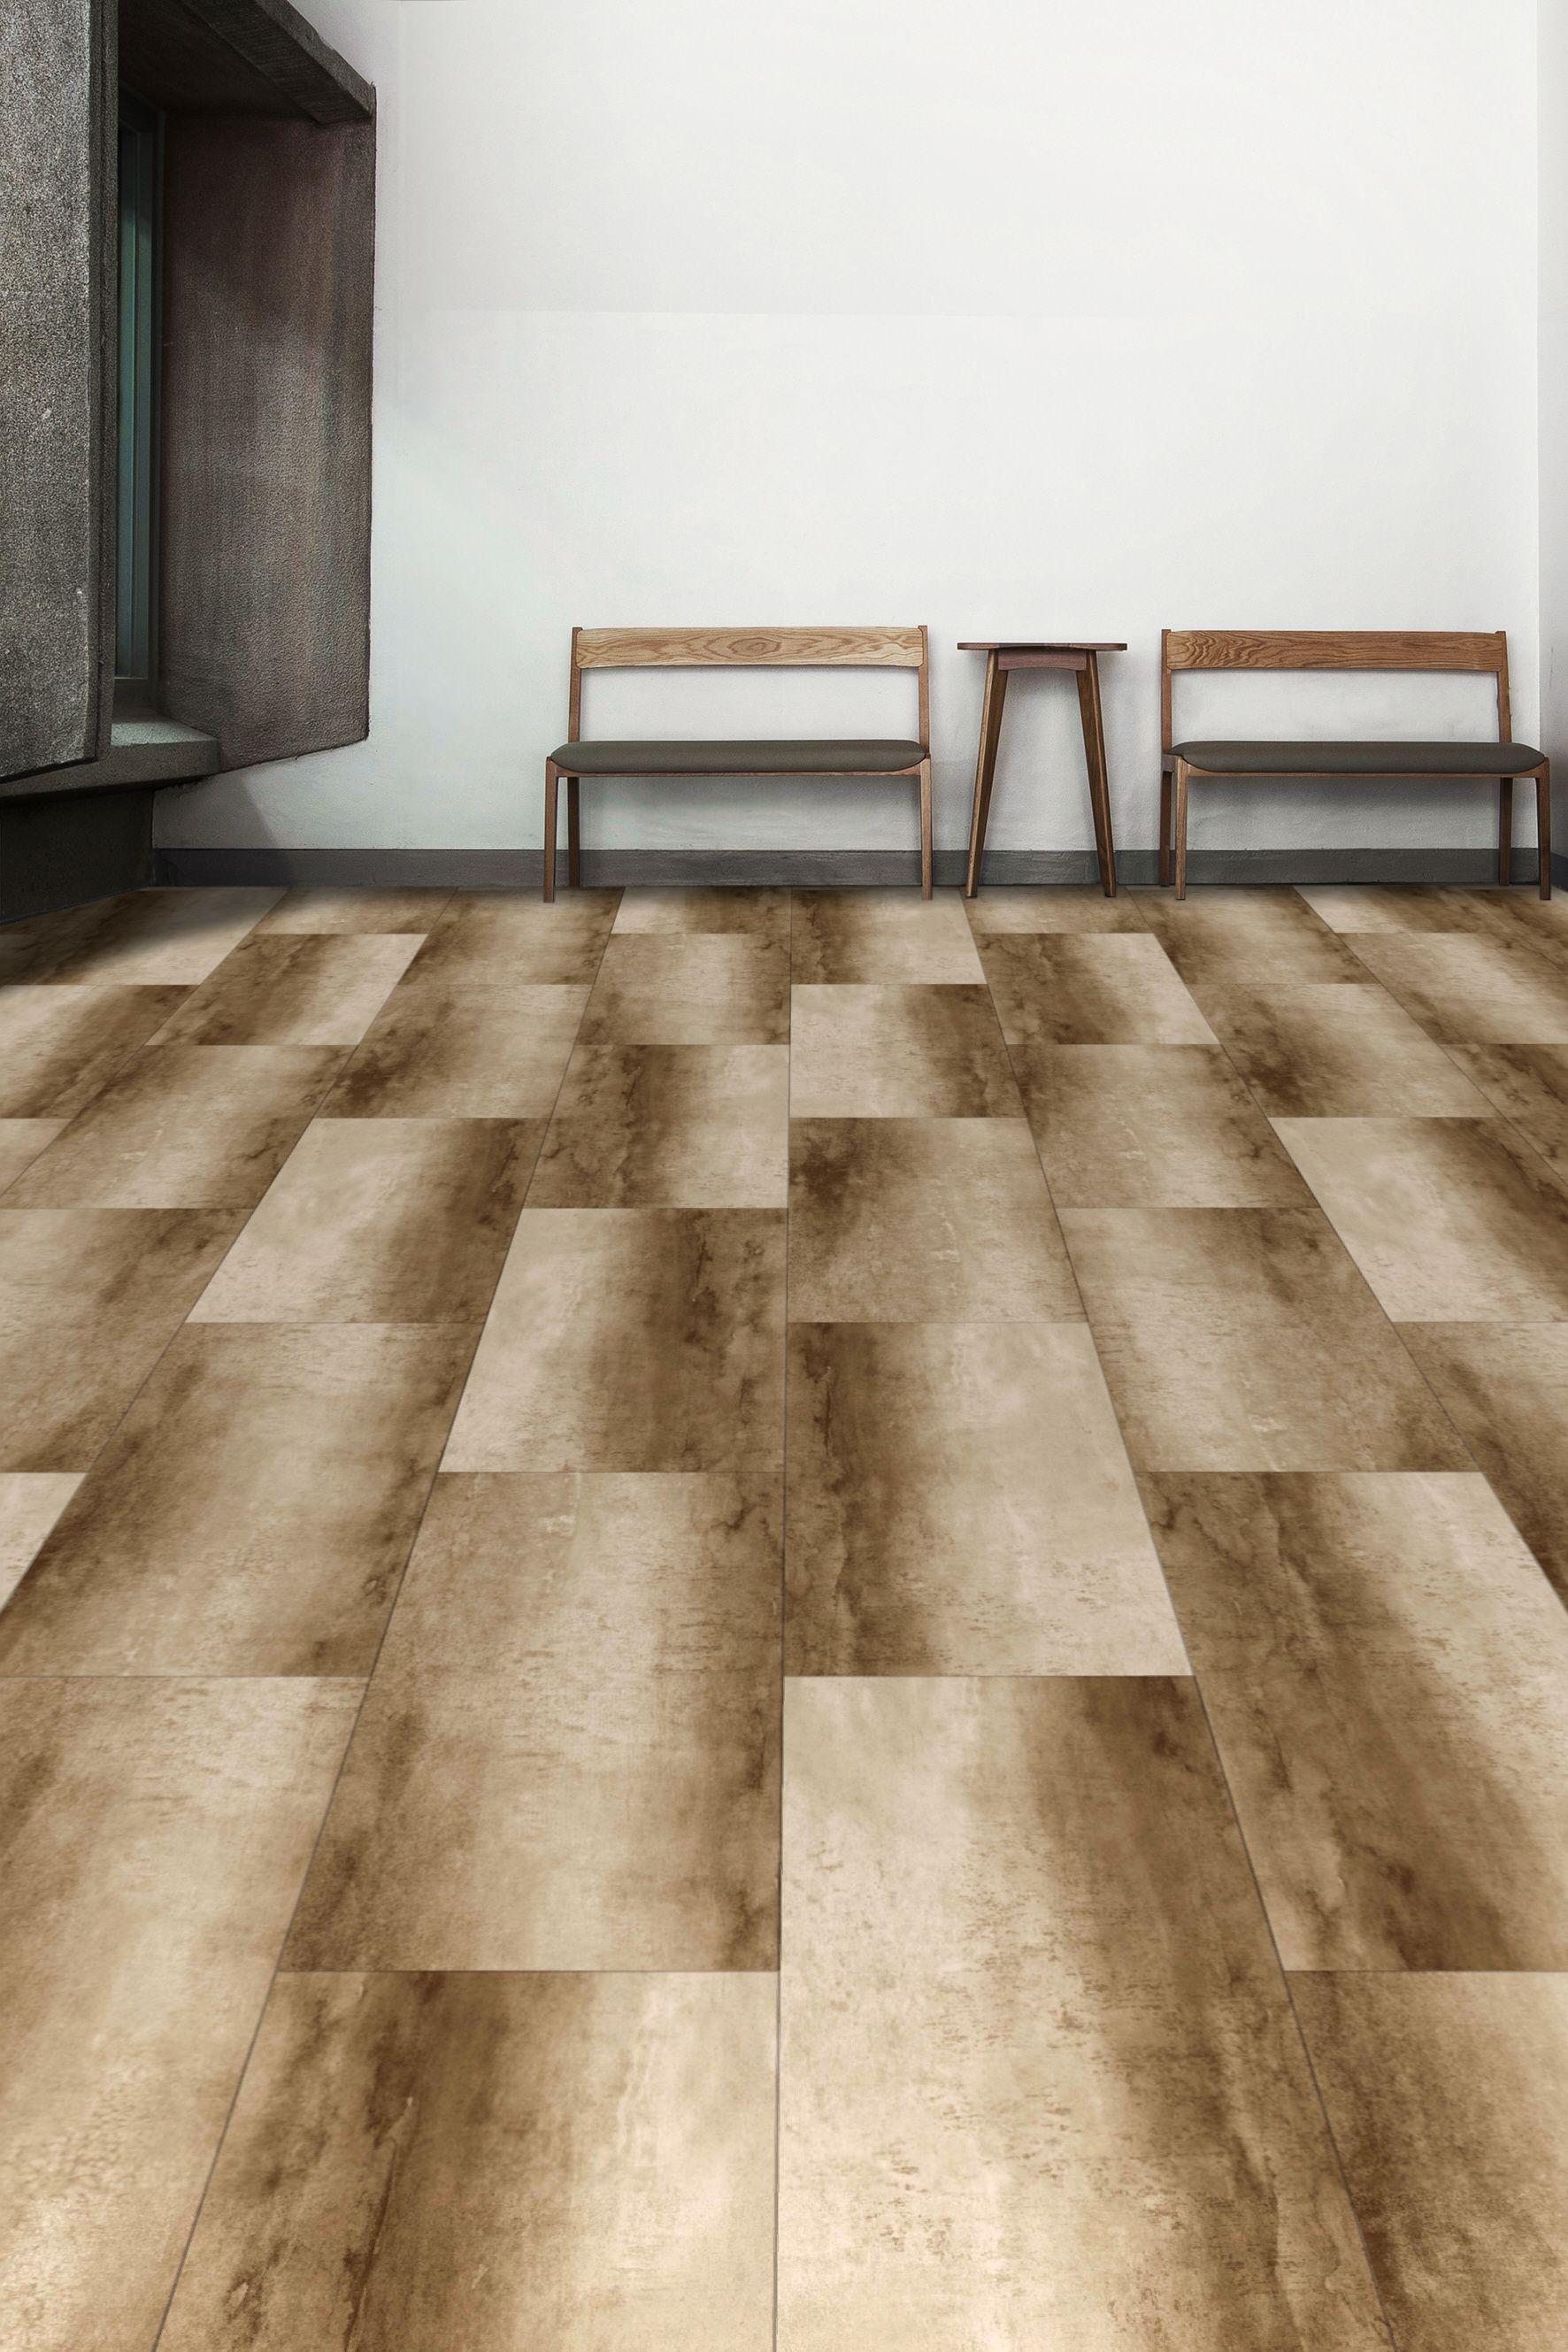 Luxury Vinyl Tile Is The Perfect Addition With Carpet Tiles, Broadloom  Carpet And Custom Rugs! #Flooring #LVT #Tile #design #office  #interiordesign ...